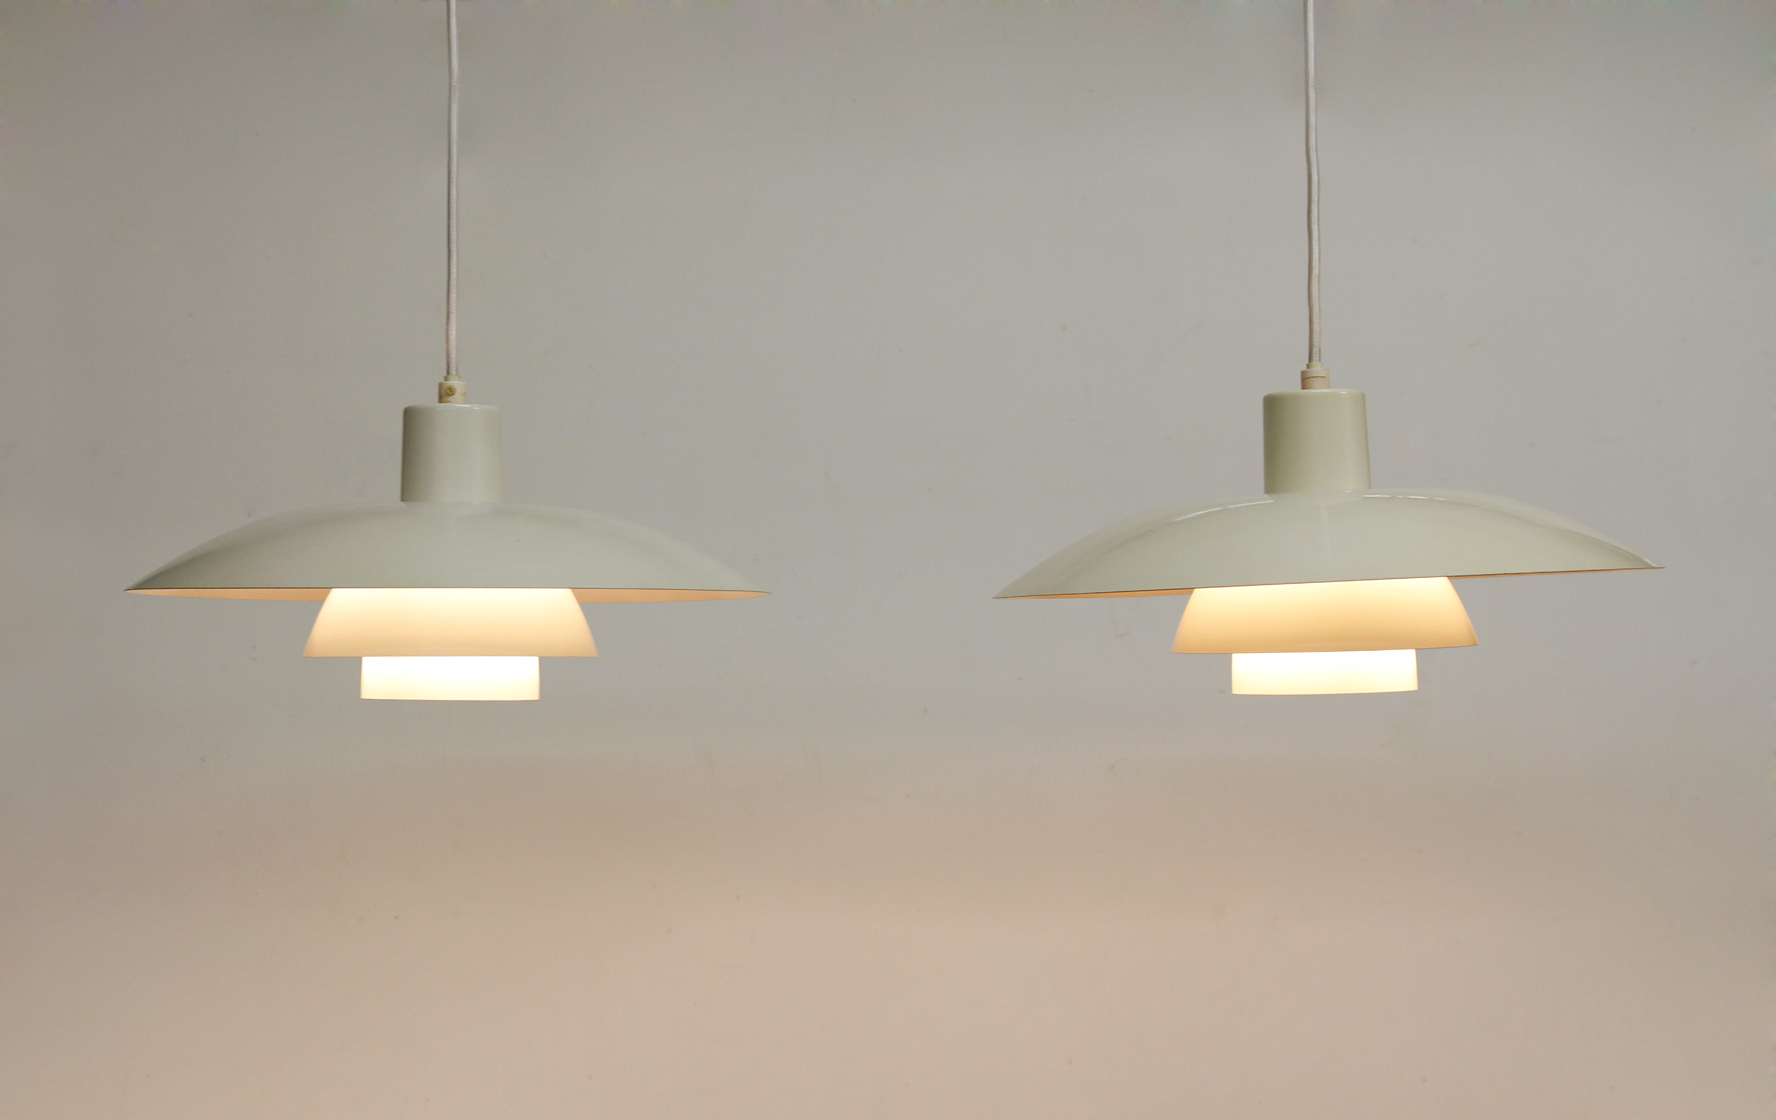 hanglamp 4 lampen simple hanglamp with hanglamp 4 lampen great louis poulsen ph lamp van poul. Black Bedroom Furniture Sets. Home Design Ideas